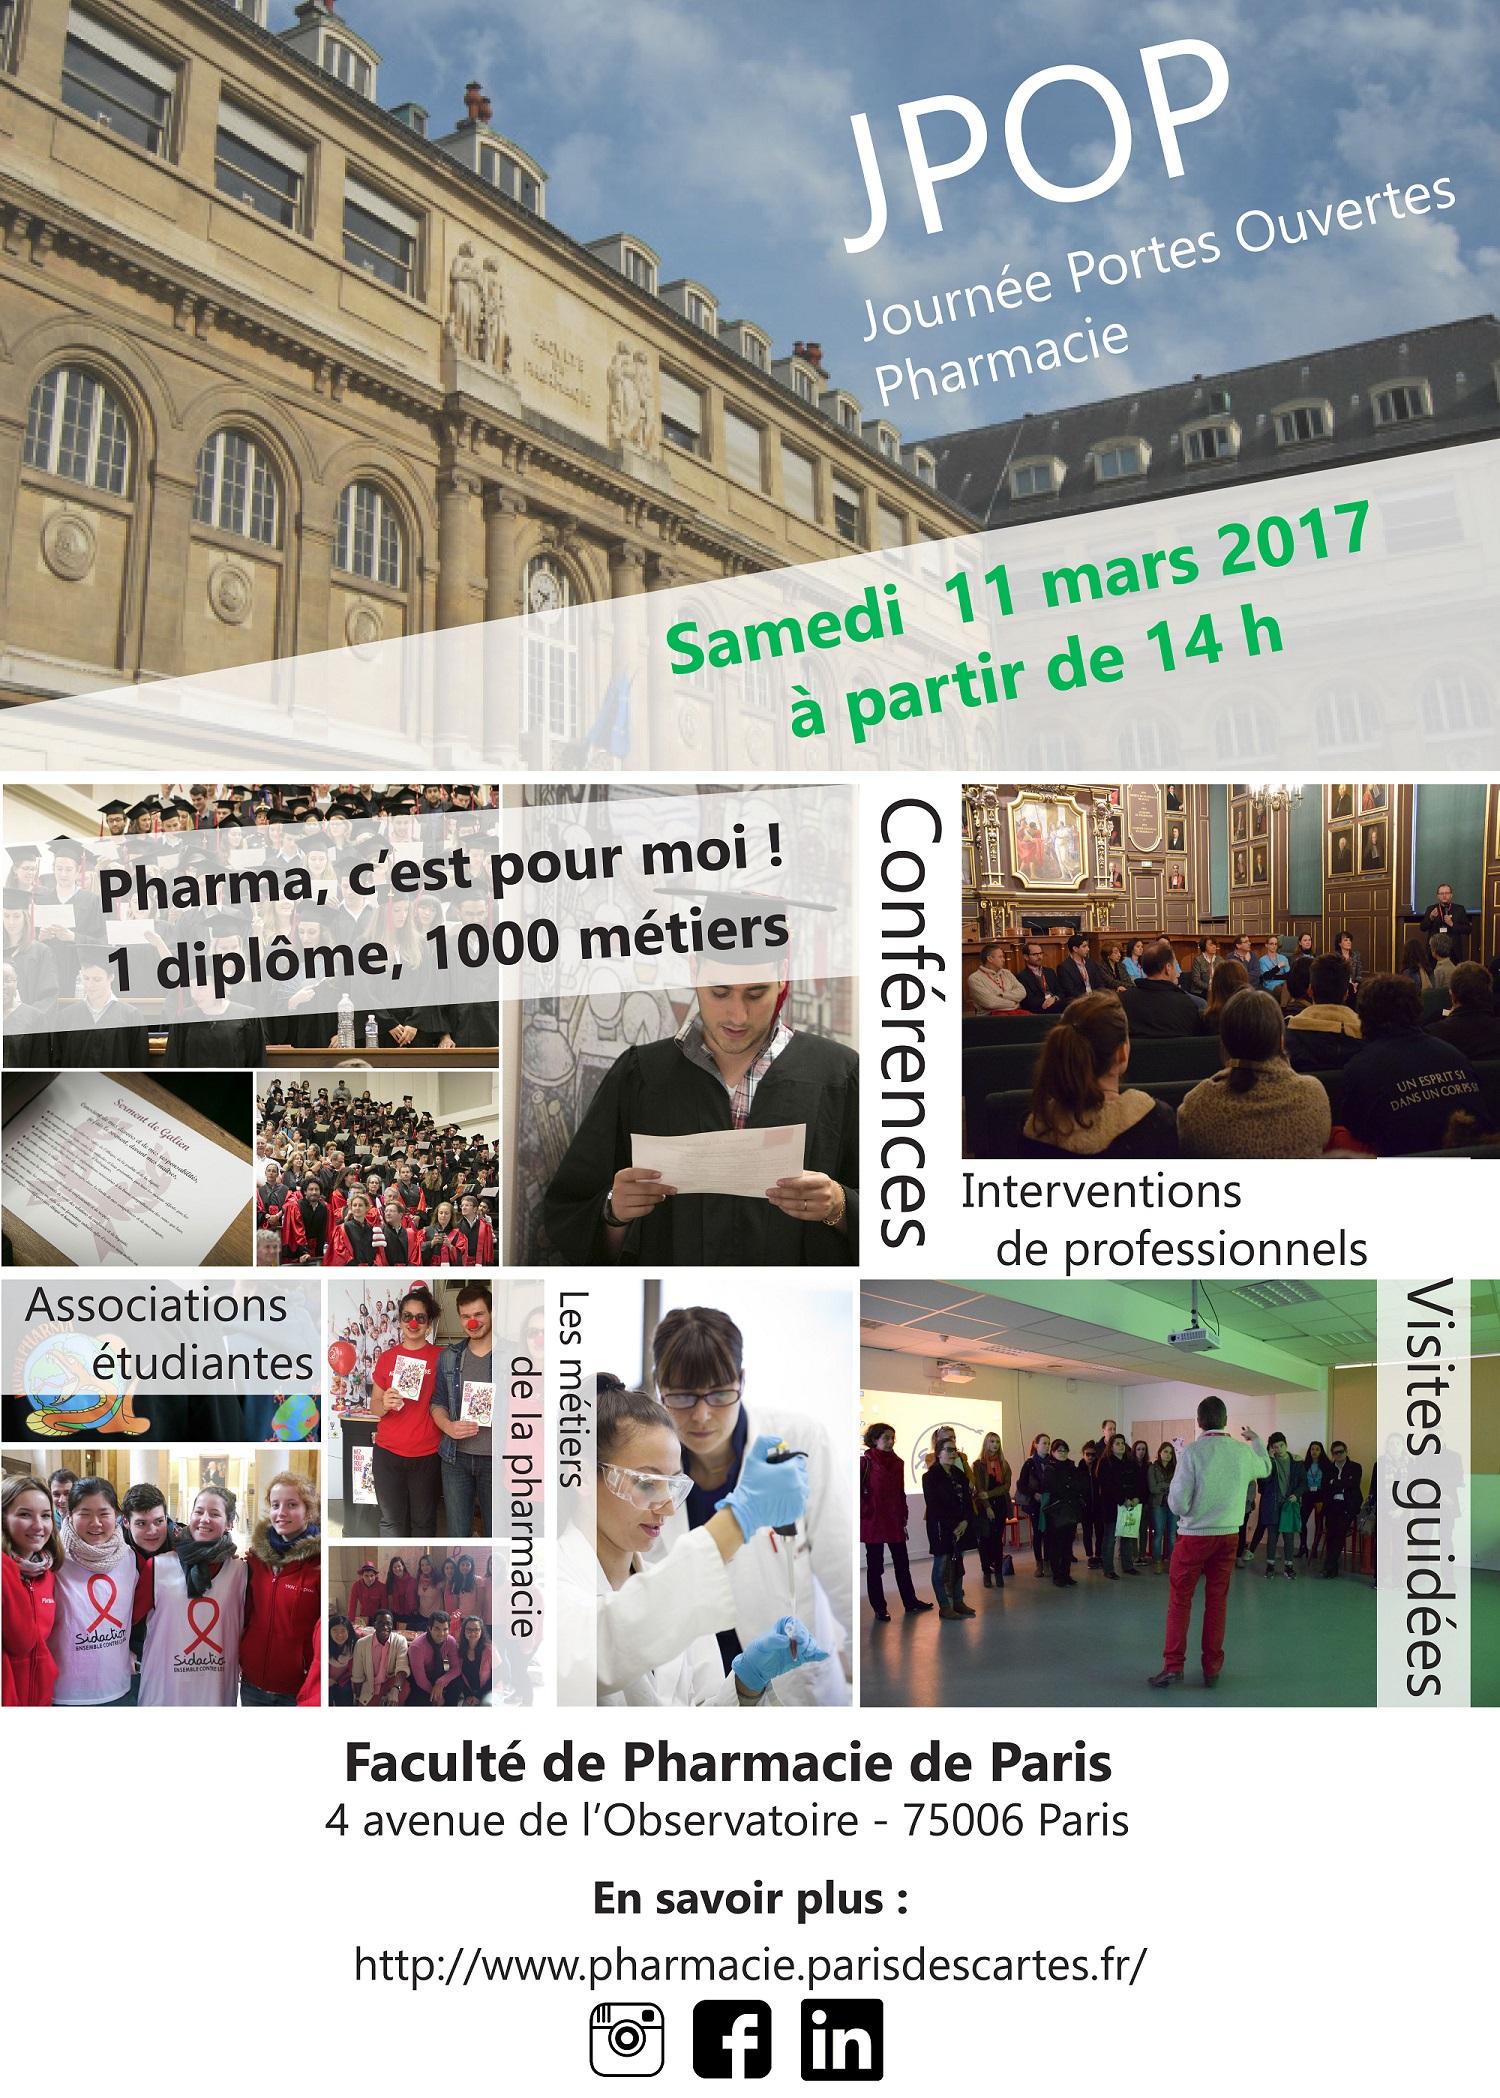 JPO de la Faculté de Pharmacie